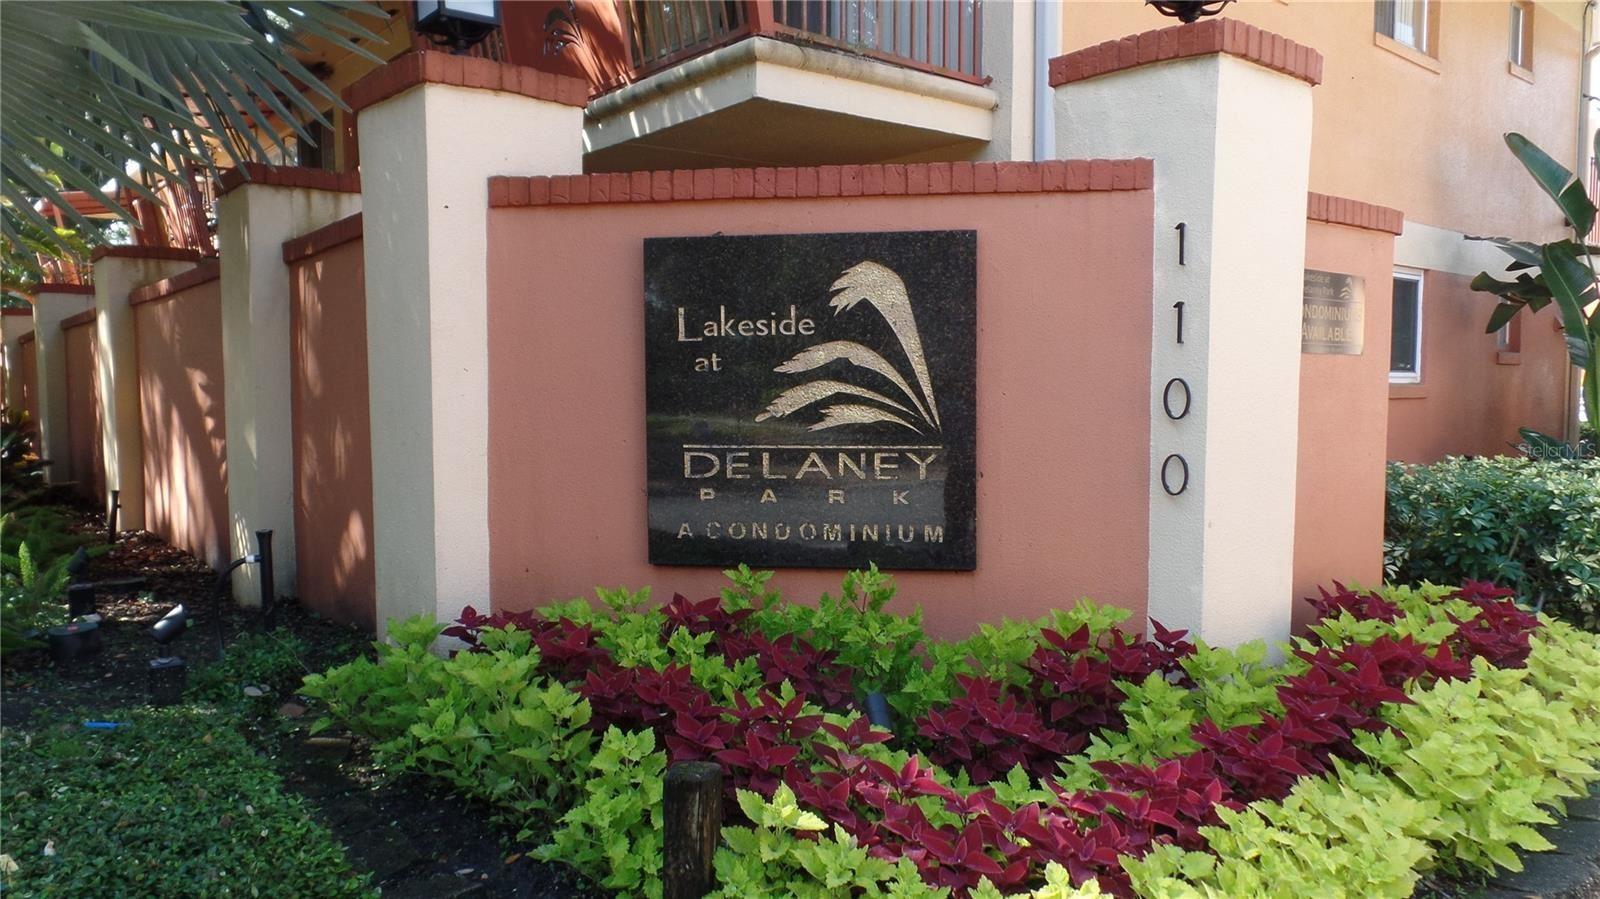 1100 DELANEY AVENUE #C22, Orlando, FL 32806 - #: O5977741